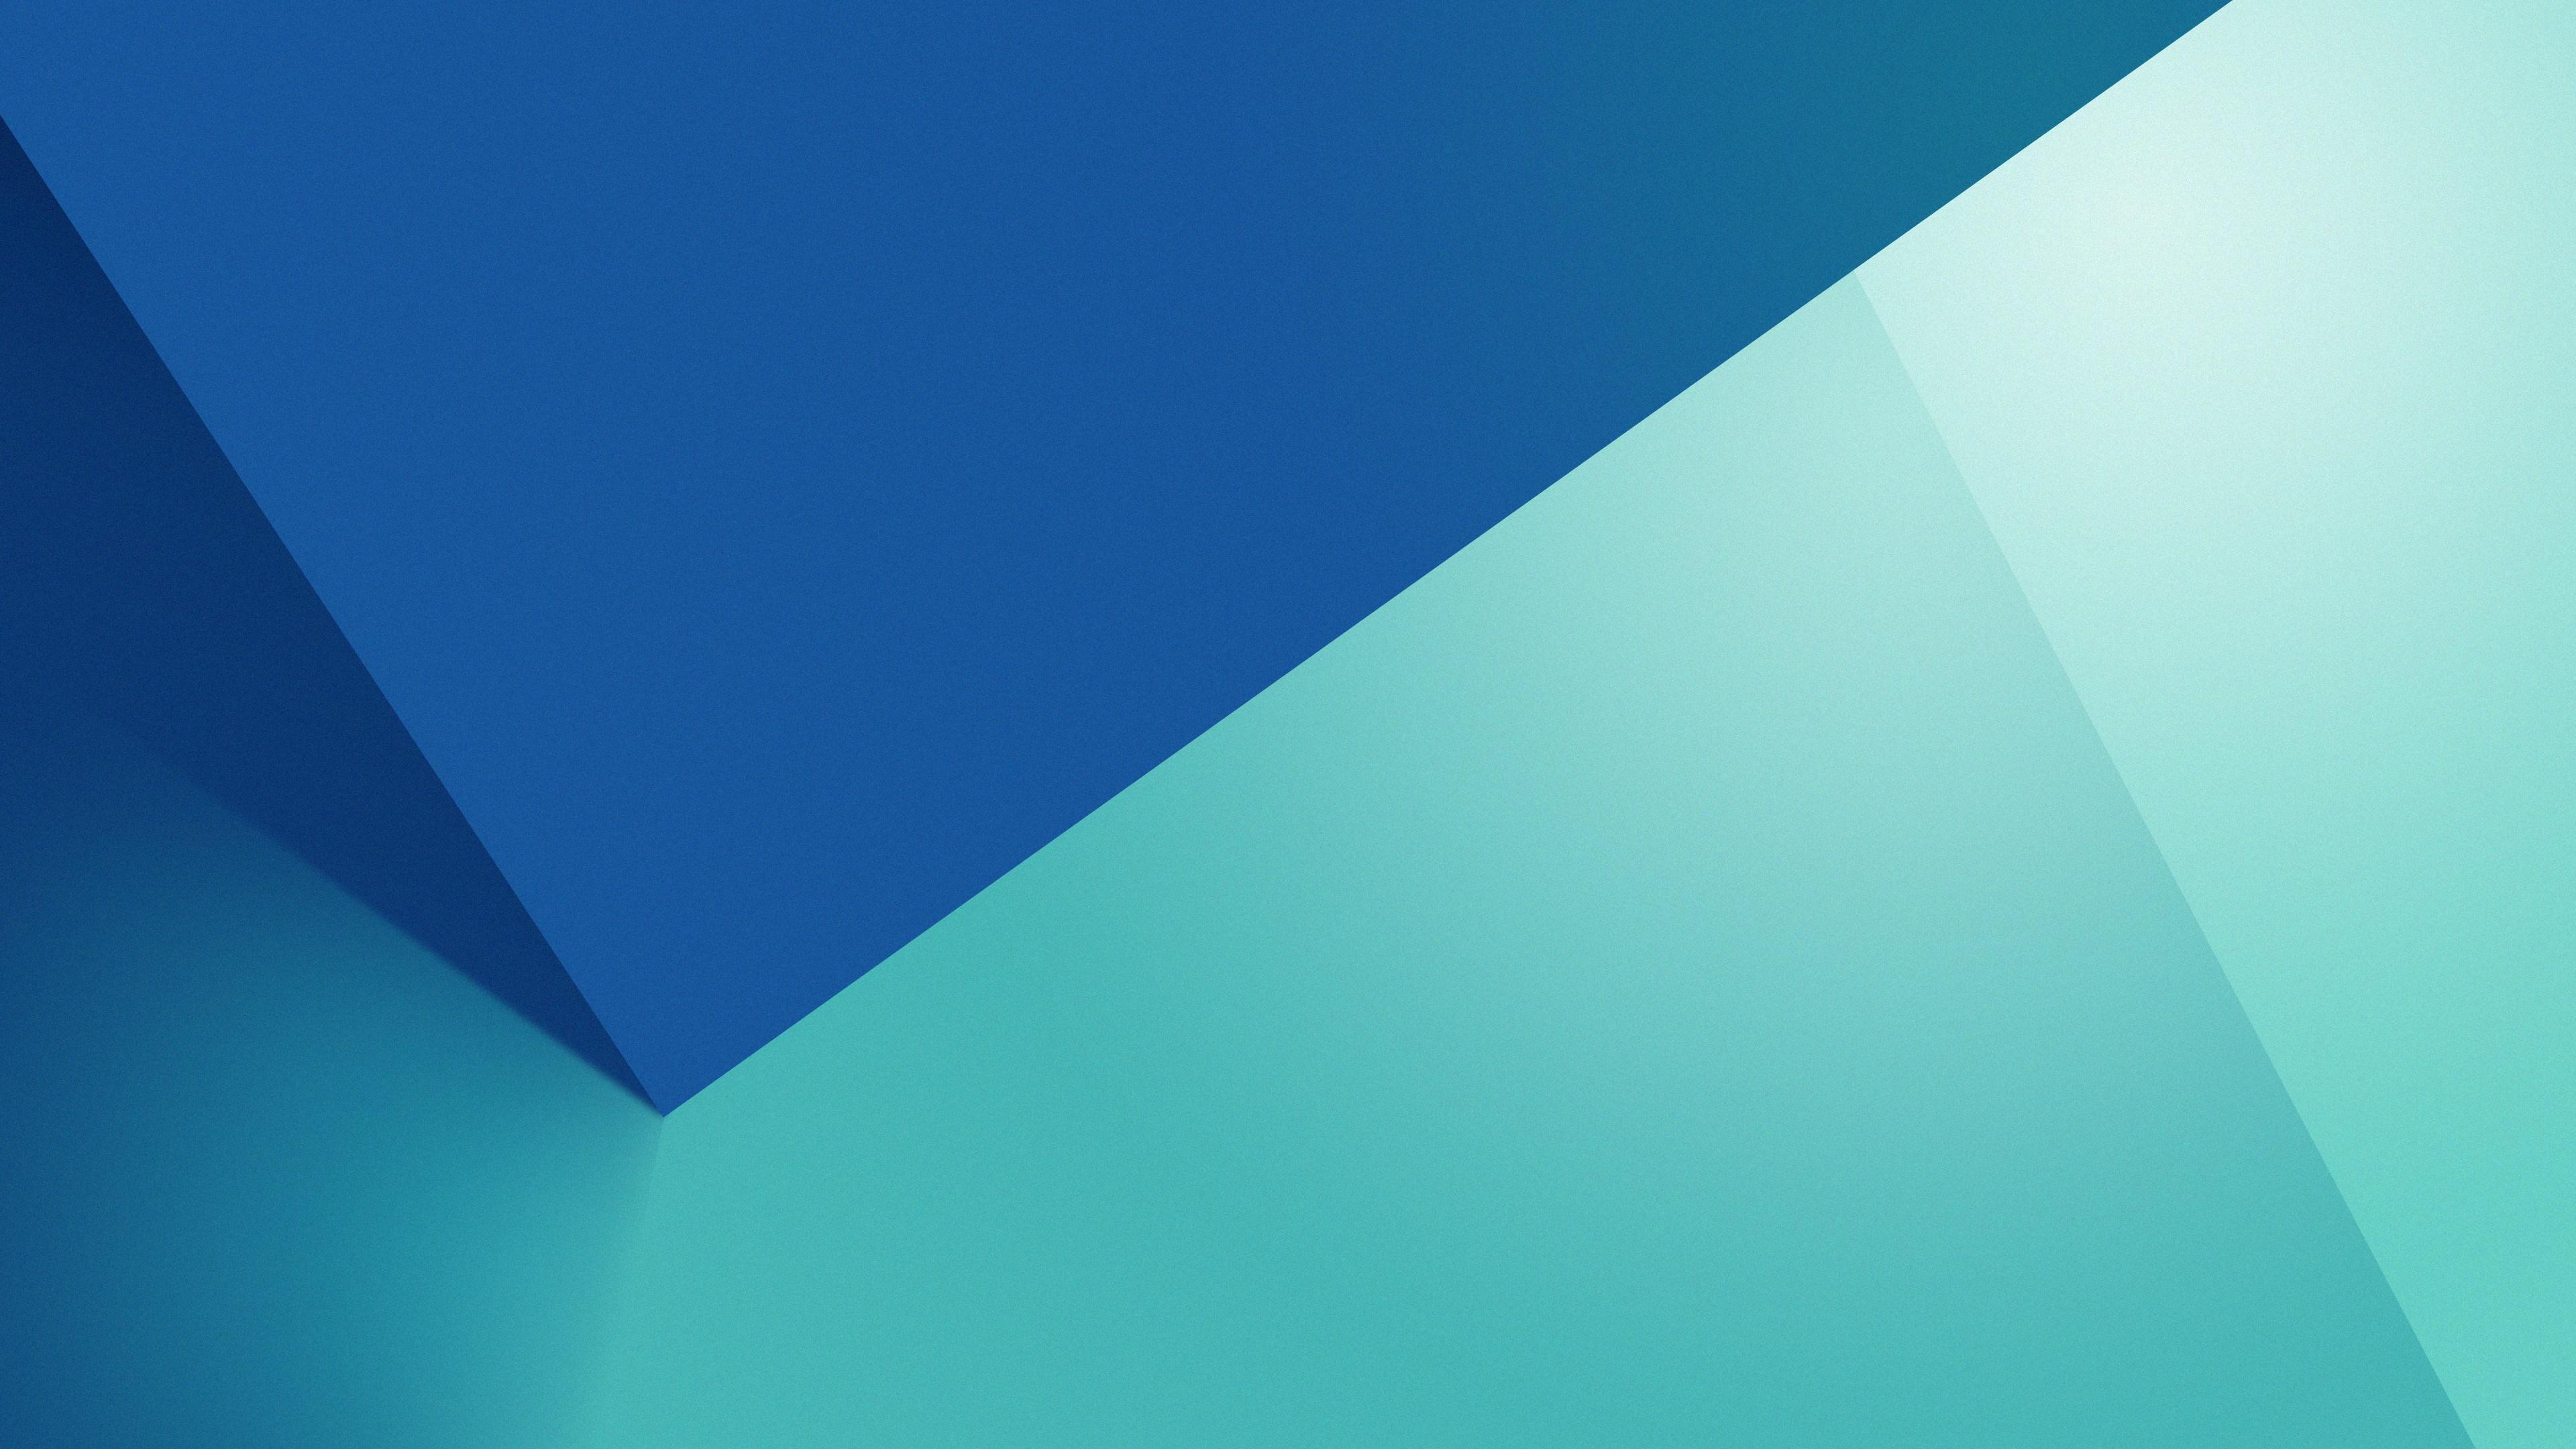 2560x1440 material design stock 4k 1440p resolution hd 4k for Material design wallpaper 4k